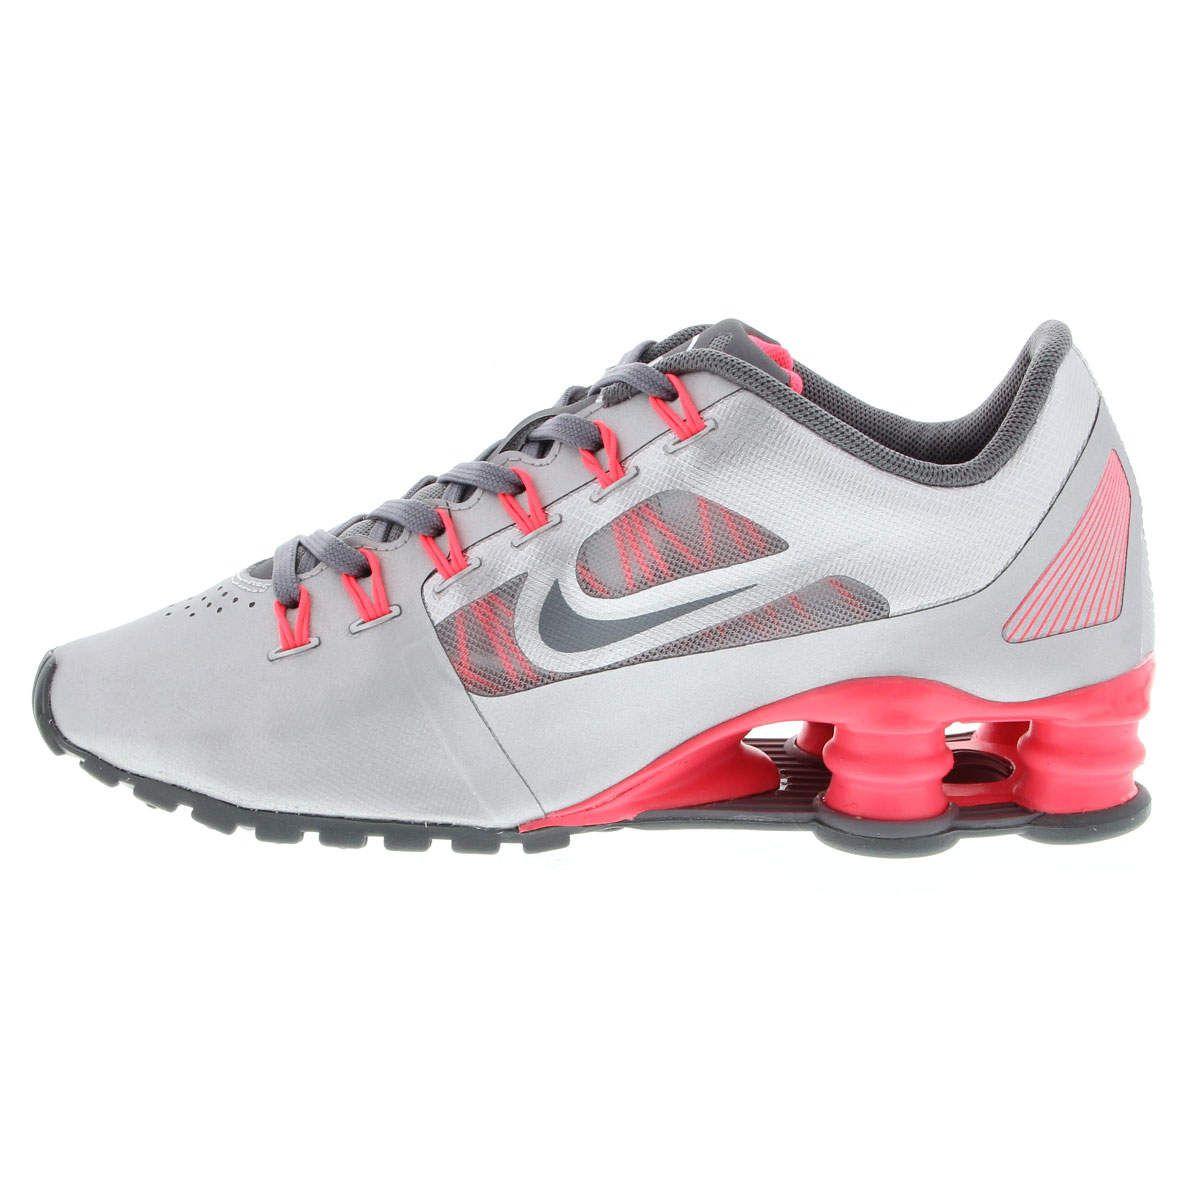 premium selection 50988 32691 Tenis Nike Shox Superfly R4 - Feminino